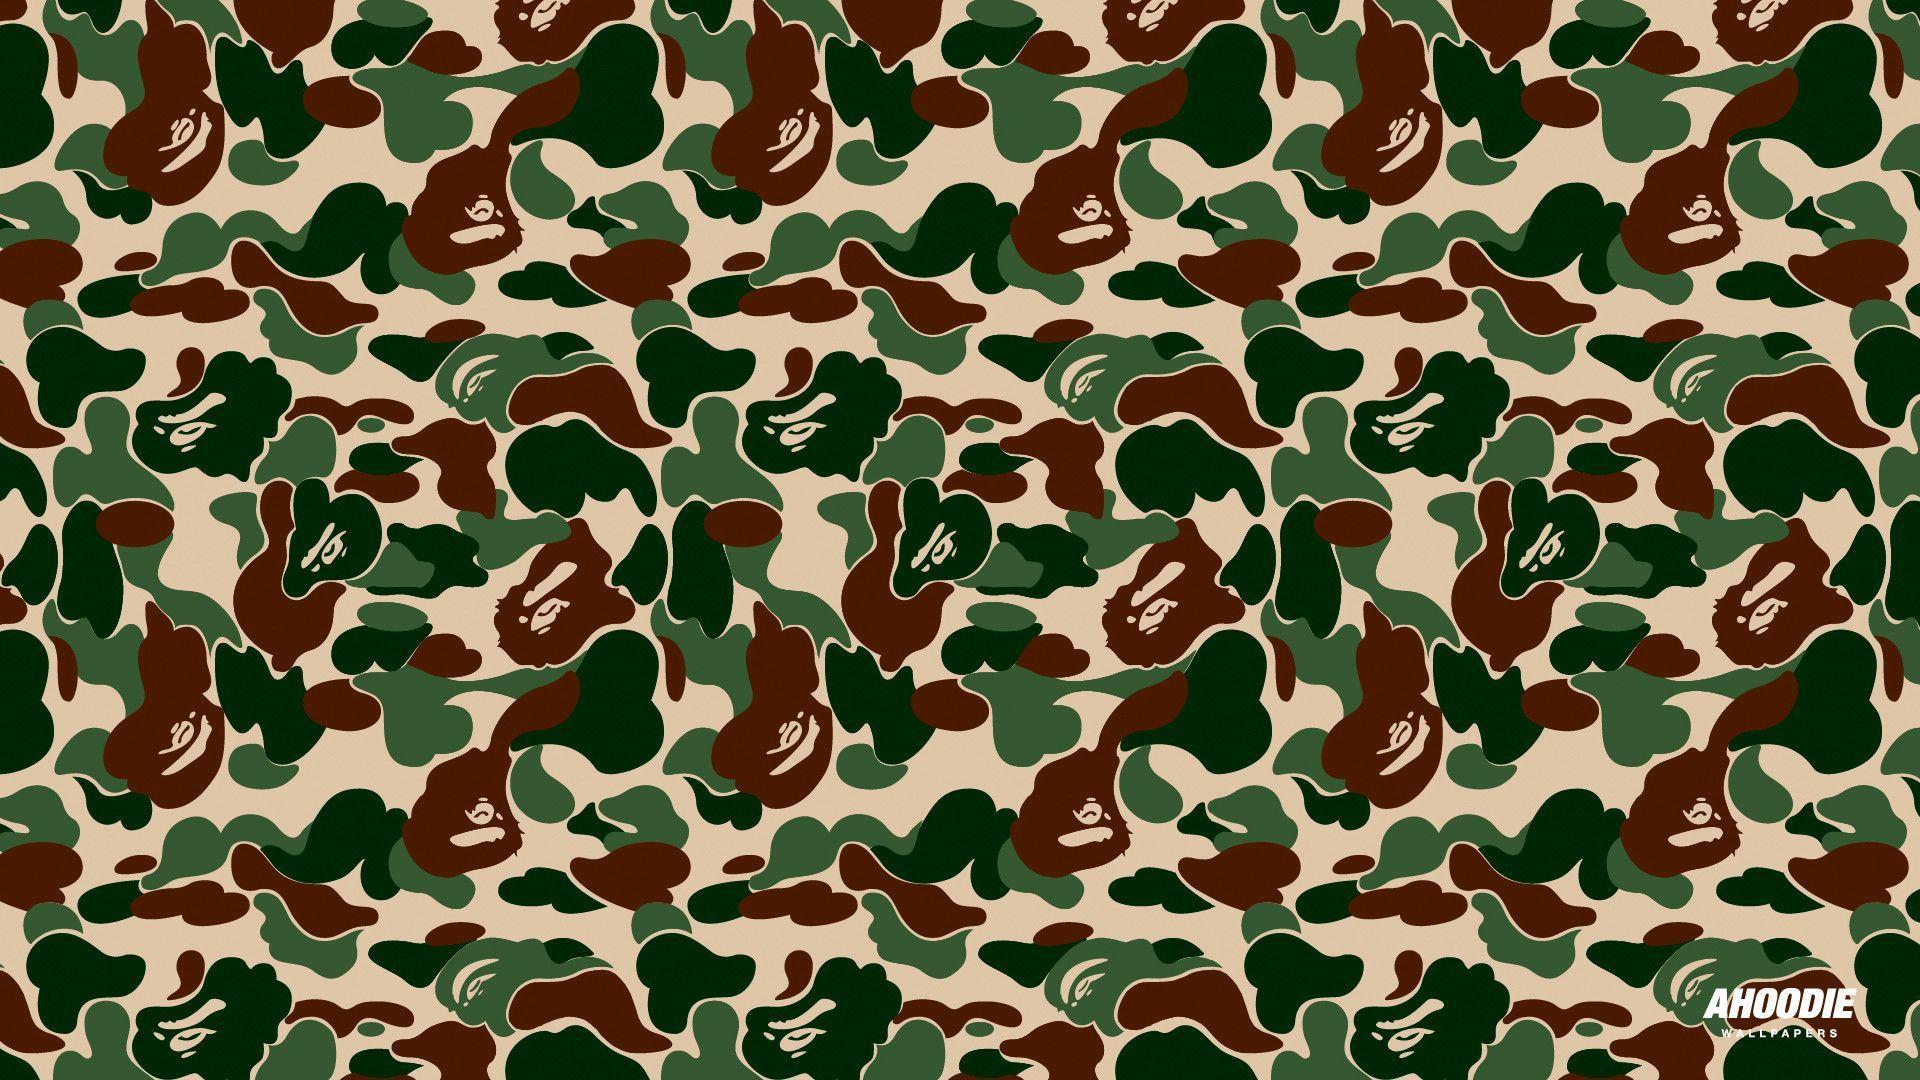 Bape Wallpapers Top Free Bape Backgrounds Wallpaperaccess